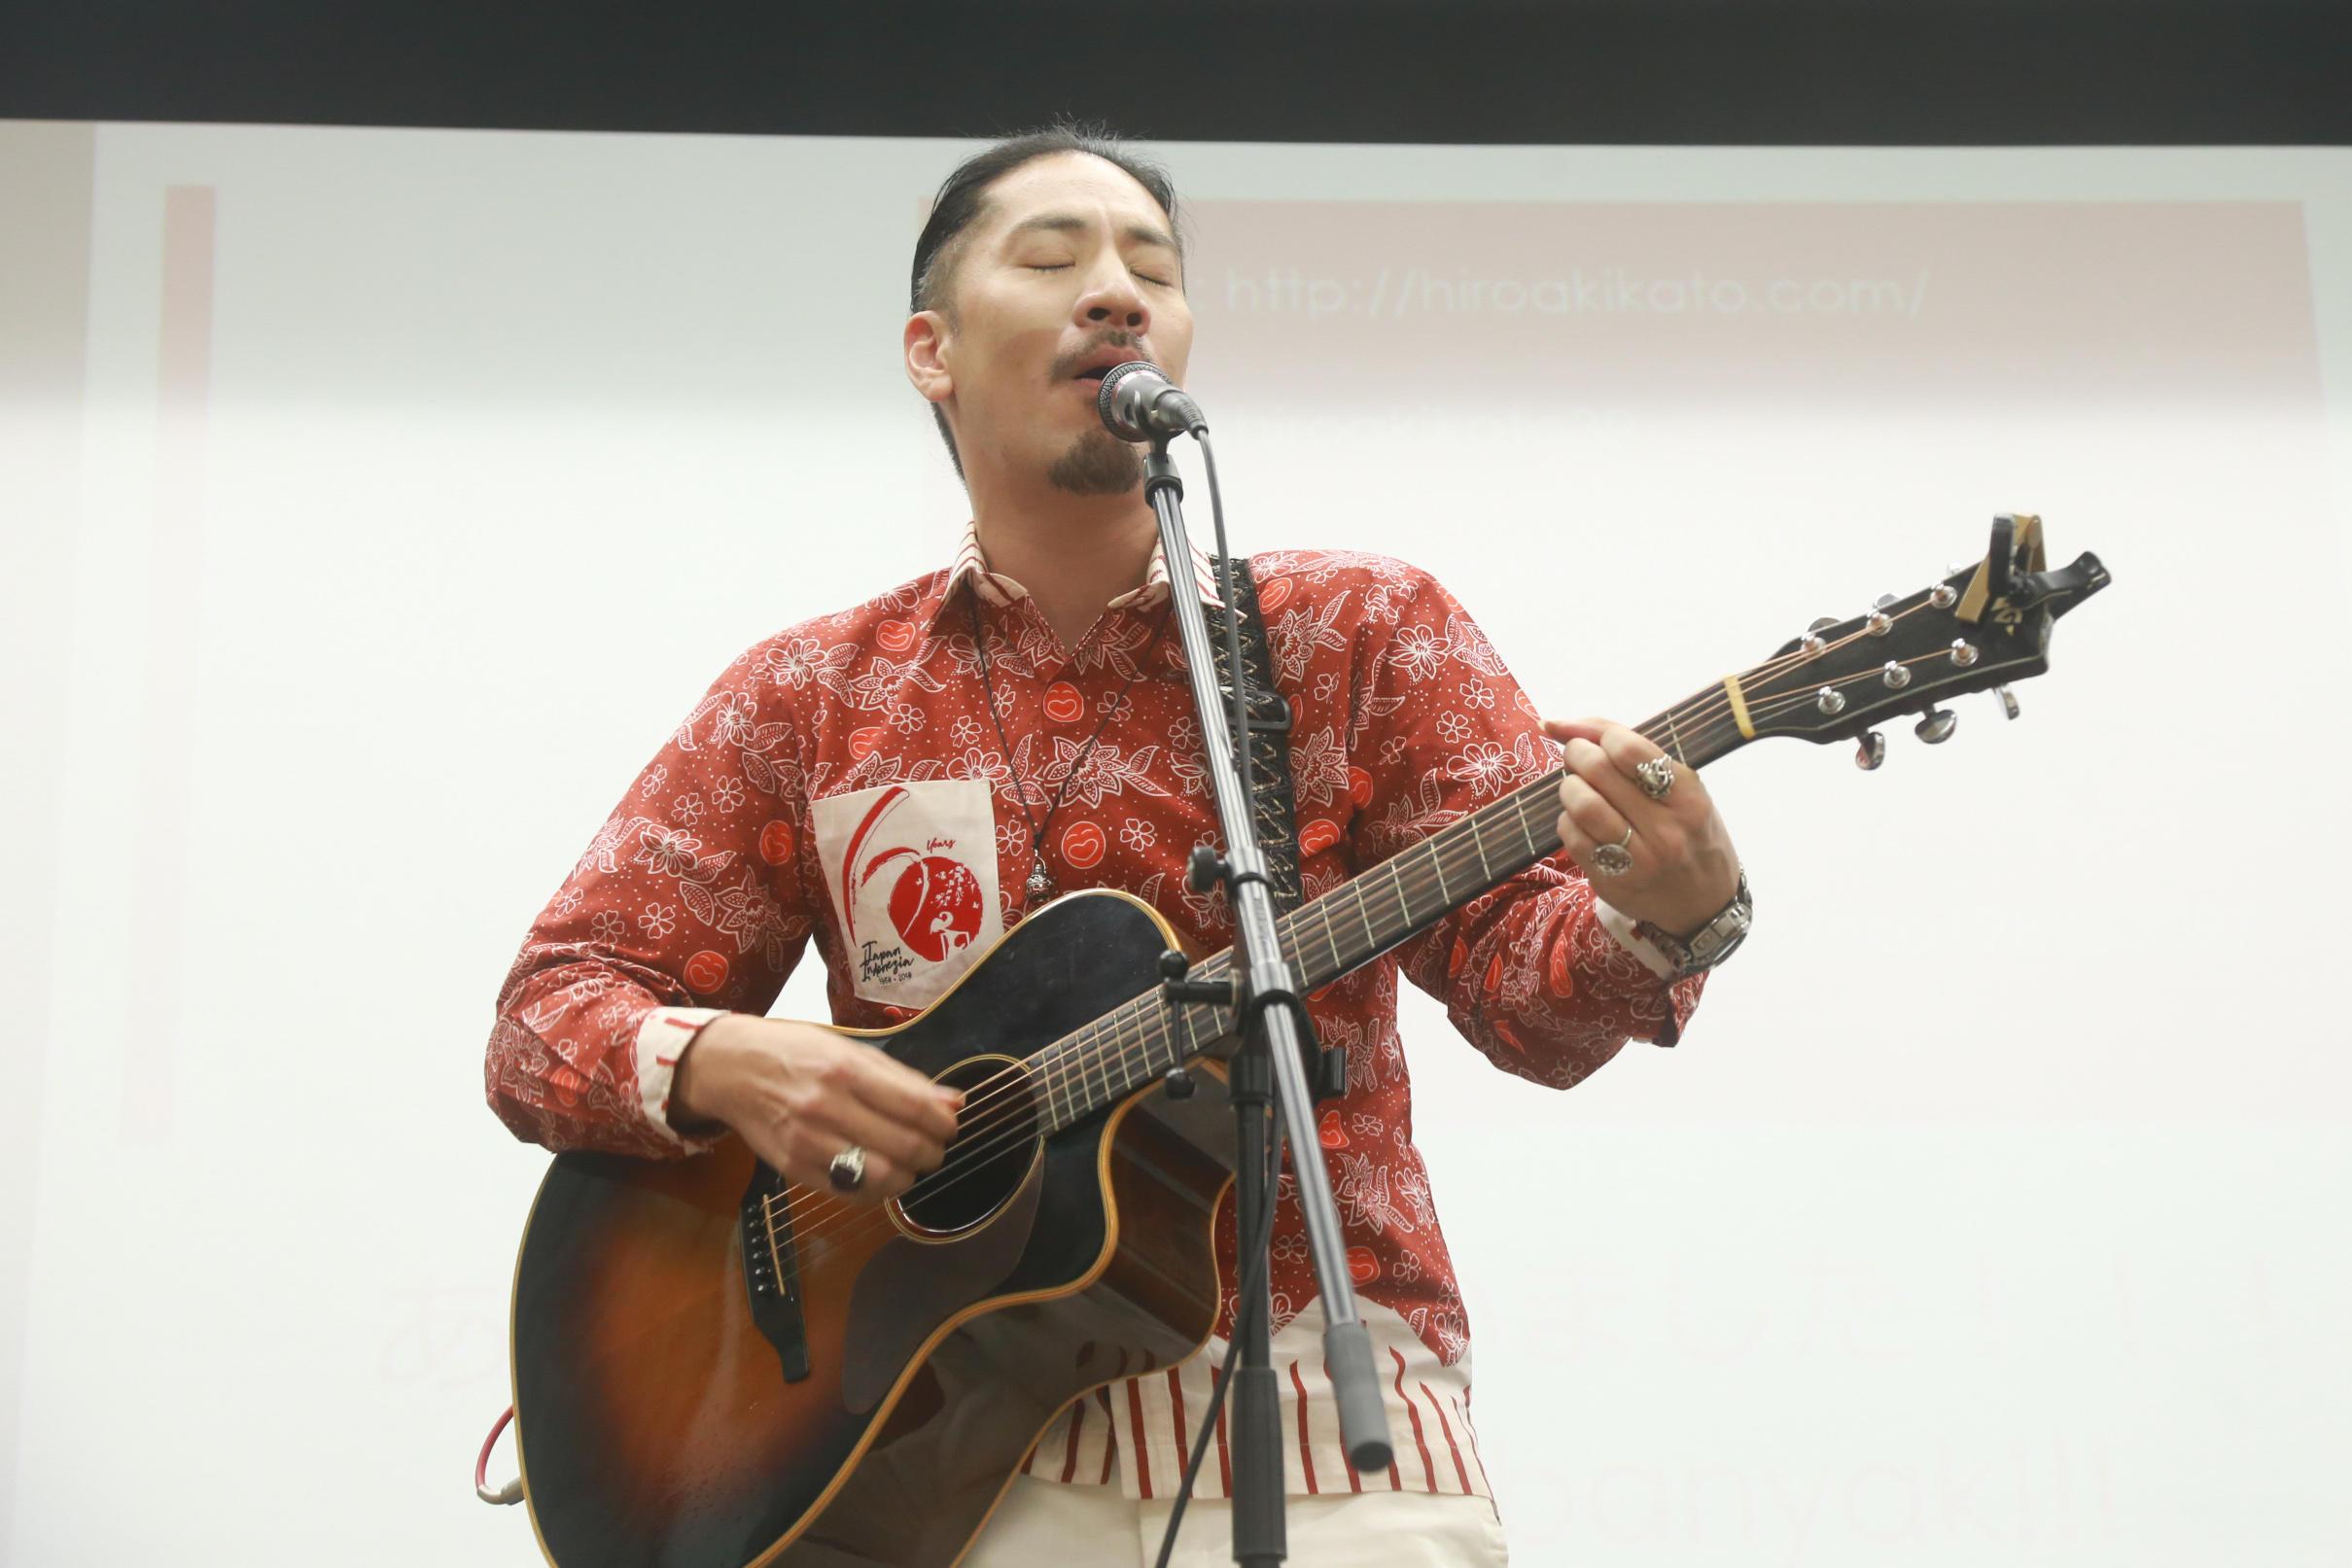 http://news.yoshimoto.co.jp/20181124214515-f5c95ea1ce0d711c3242e2075f03cd1874316109.jpg